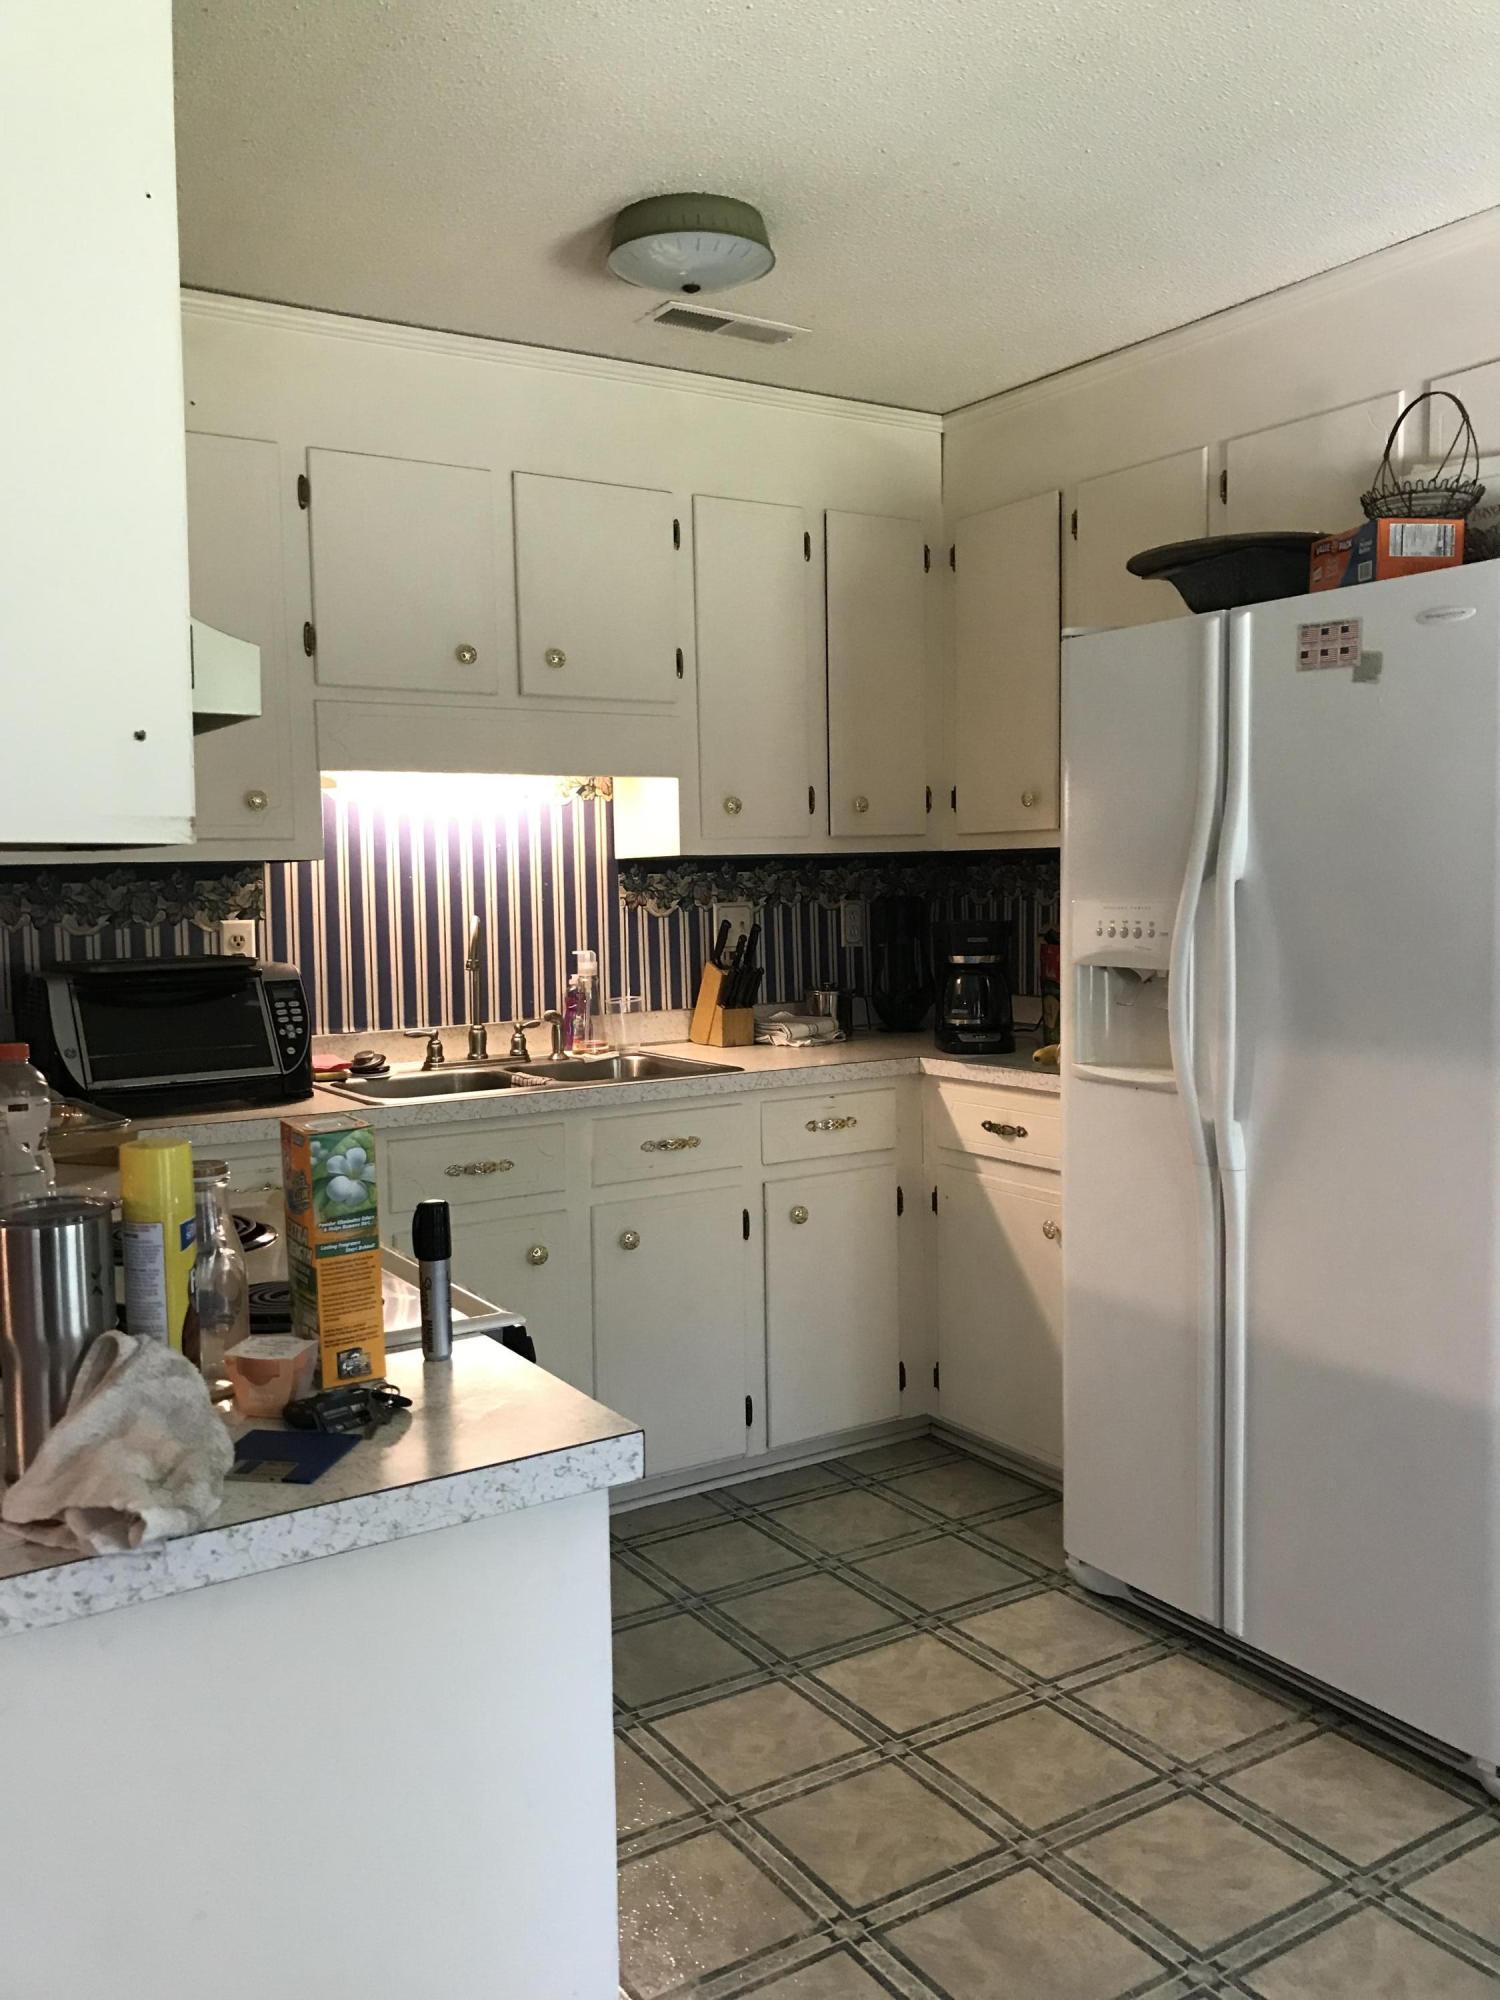 Harborgate Shores Homes For Sale - 1123 Island View, Mount Pleasant, SC - 2